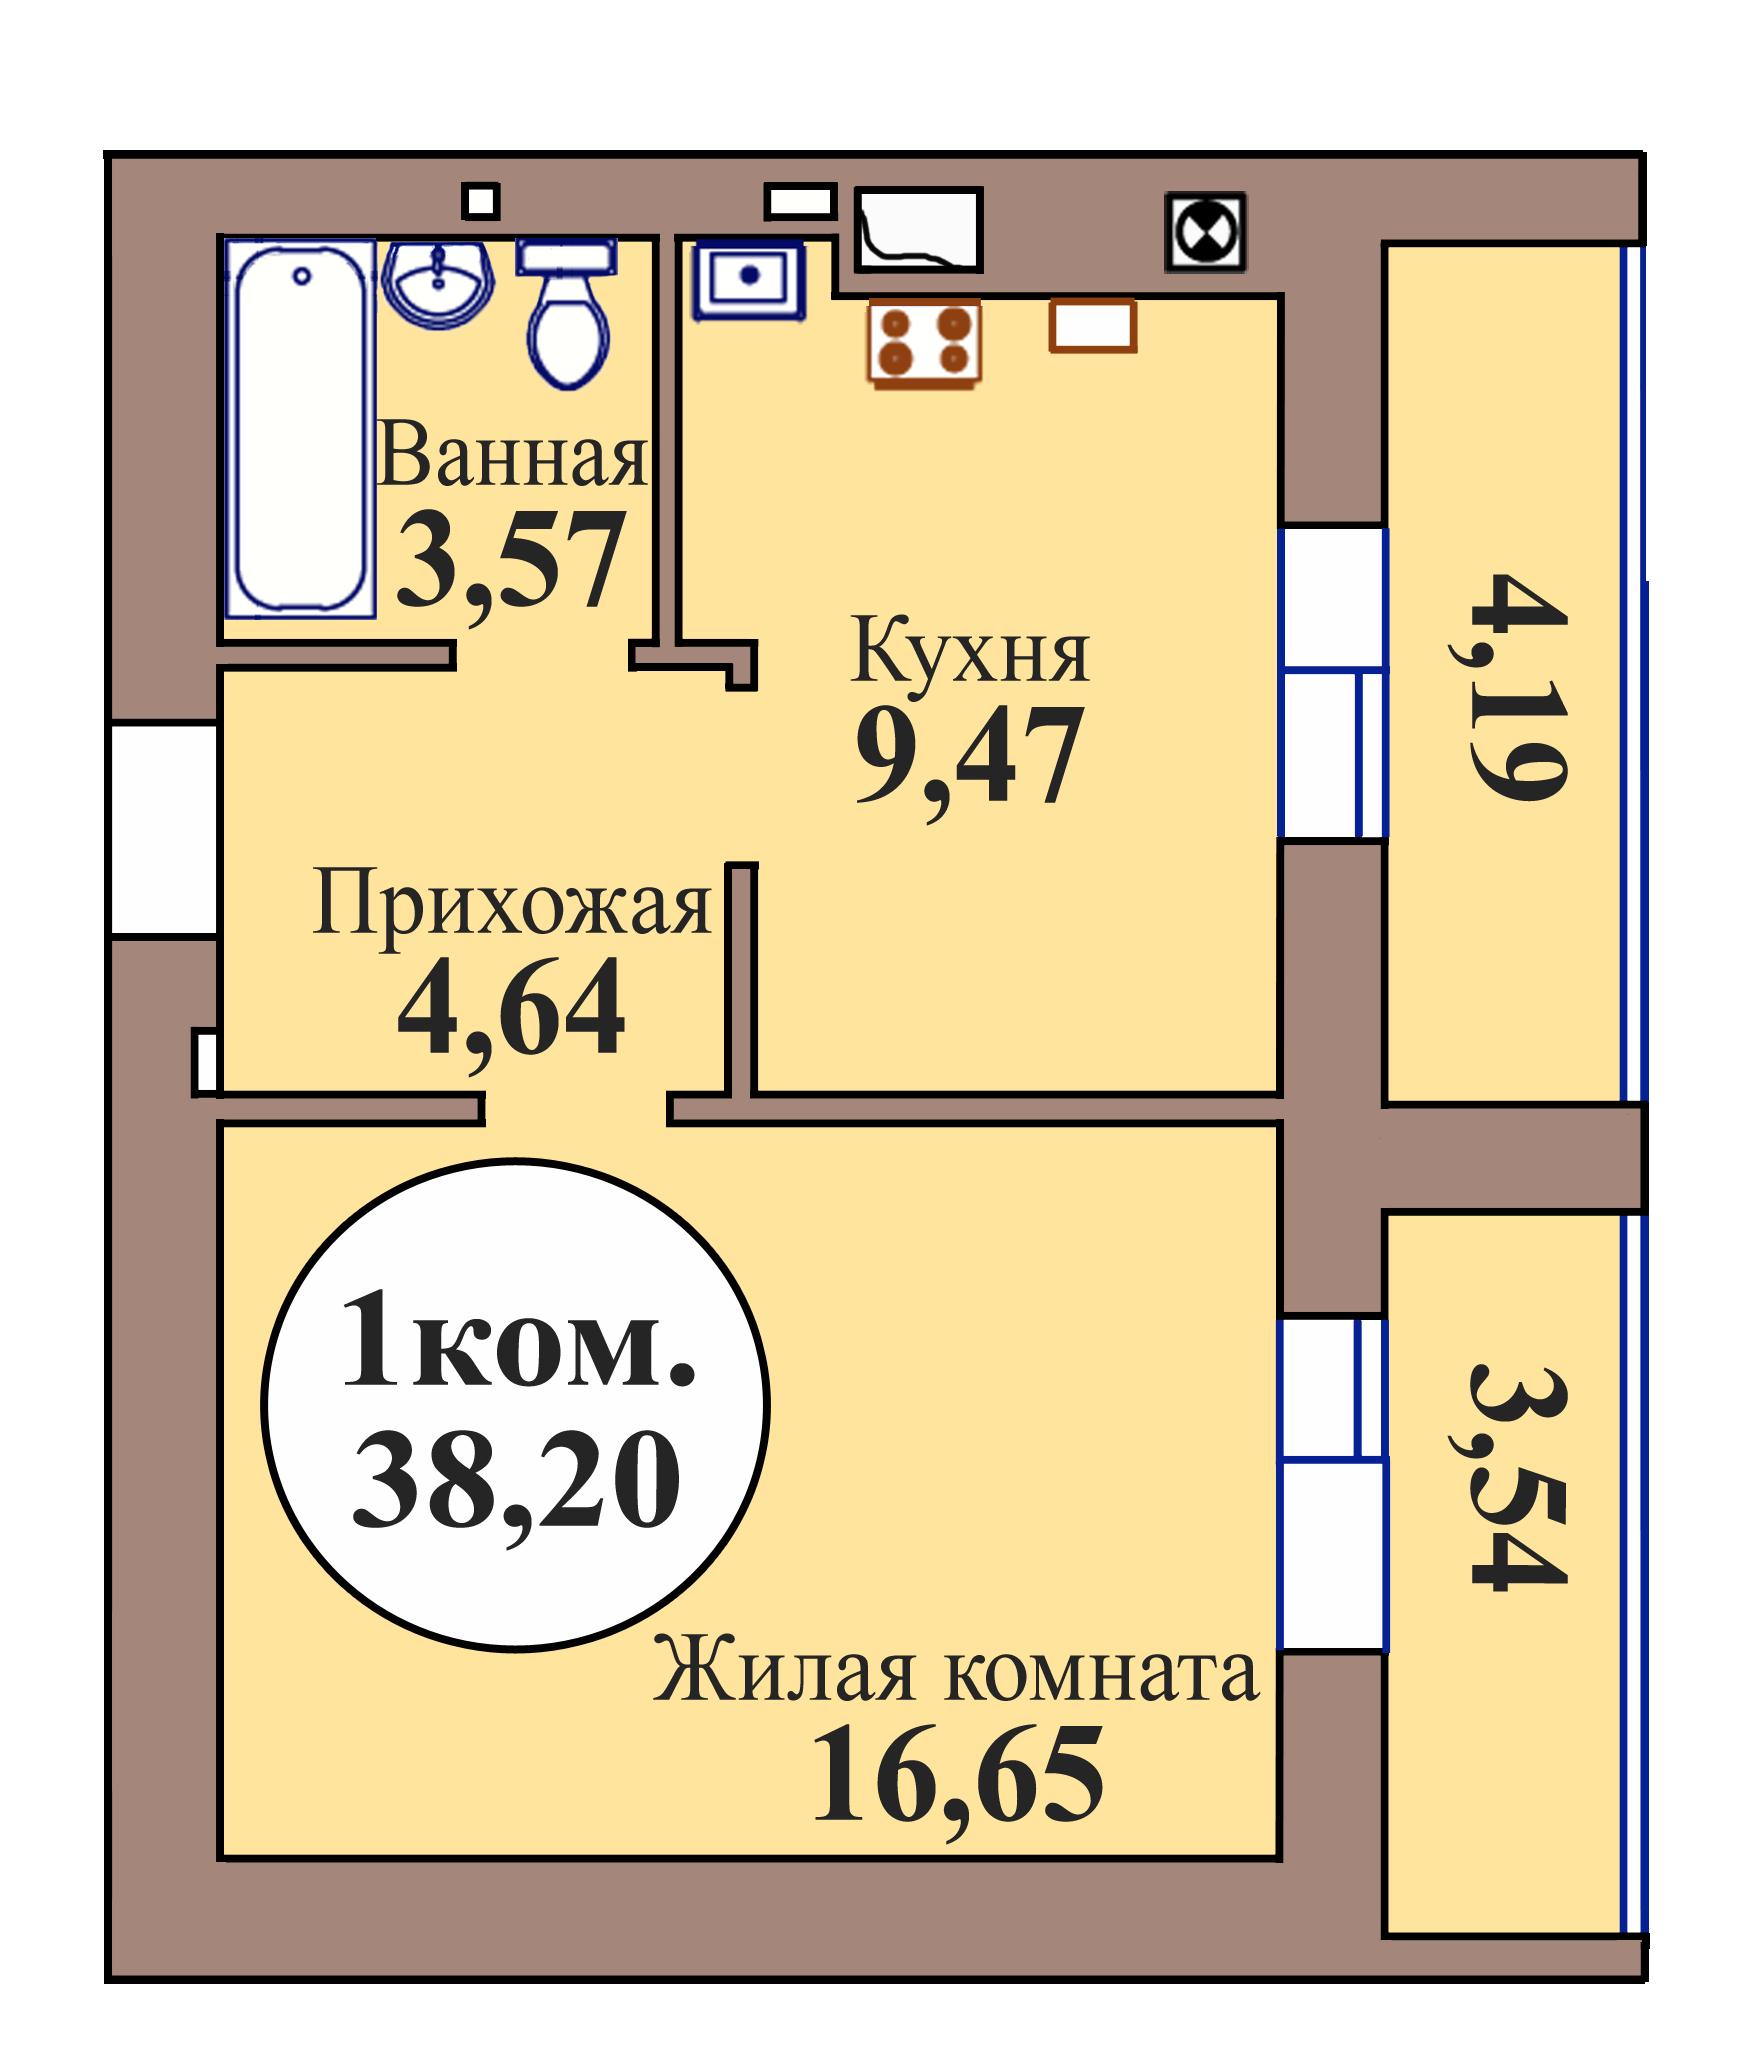 1-комн. кв. по пер. Калининградский, 5 кв. 17 в Калининграде